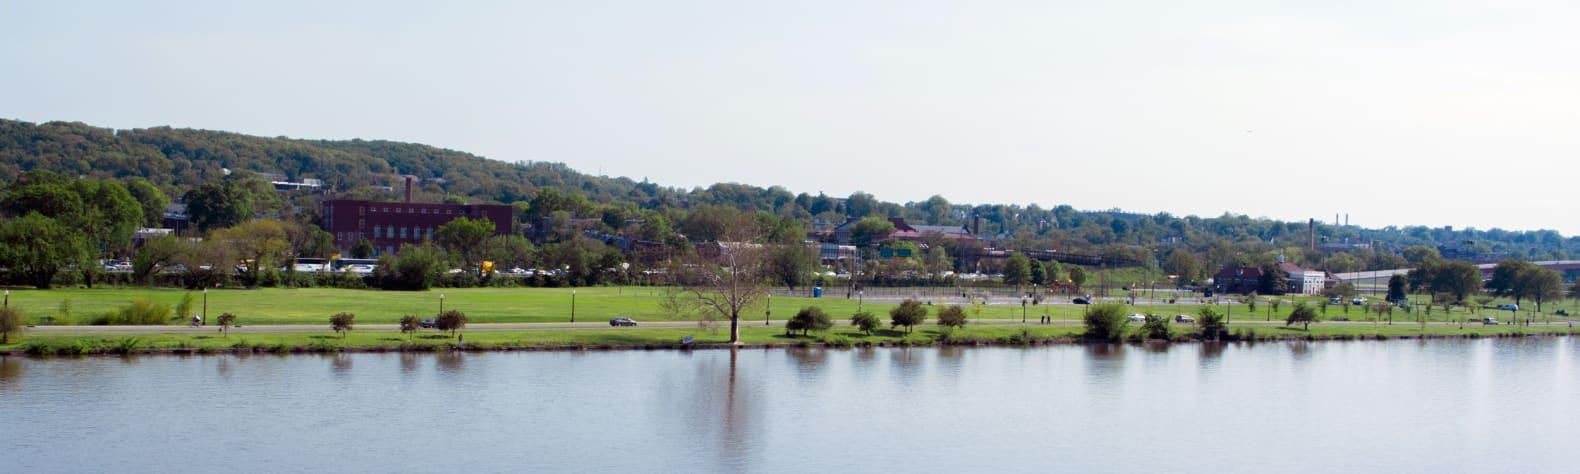 Anacostia Park